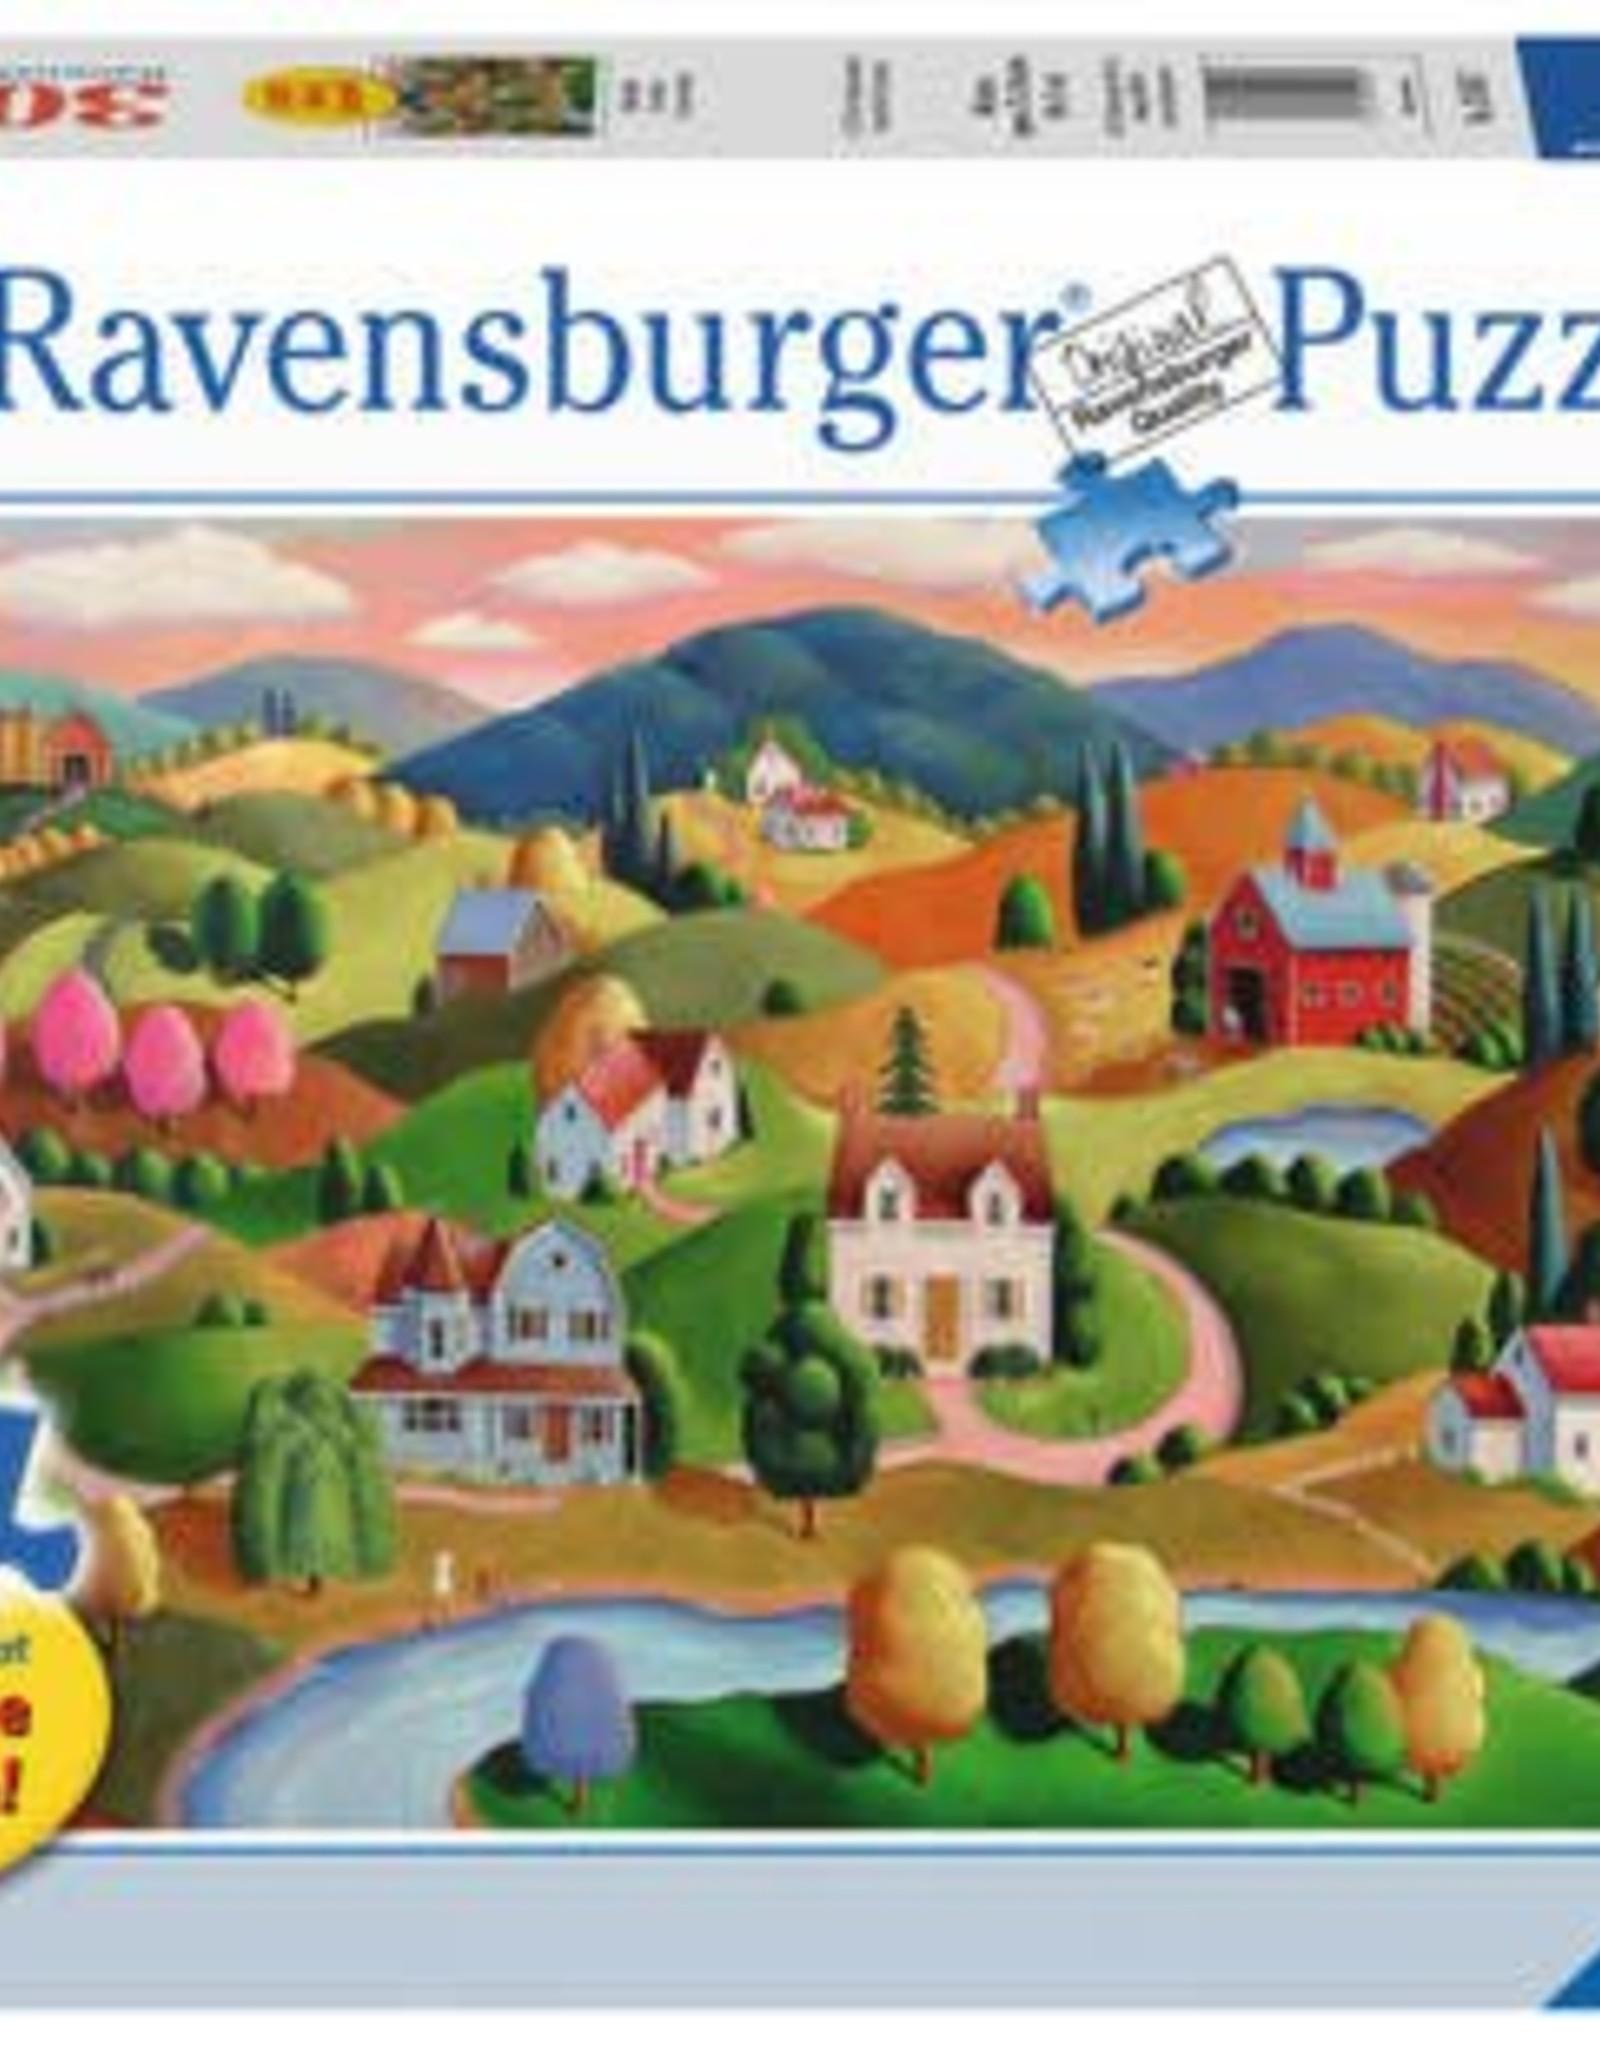 Ravensburger Rolling Hills 300pc Puzzle Large Format